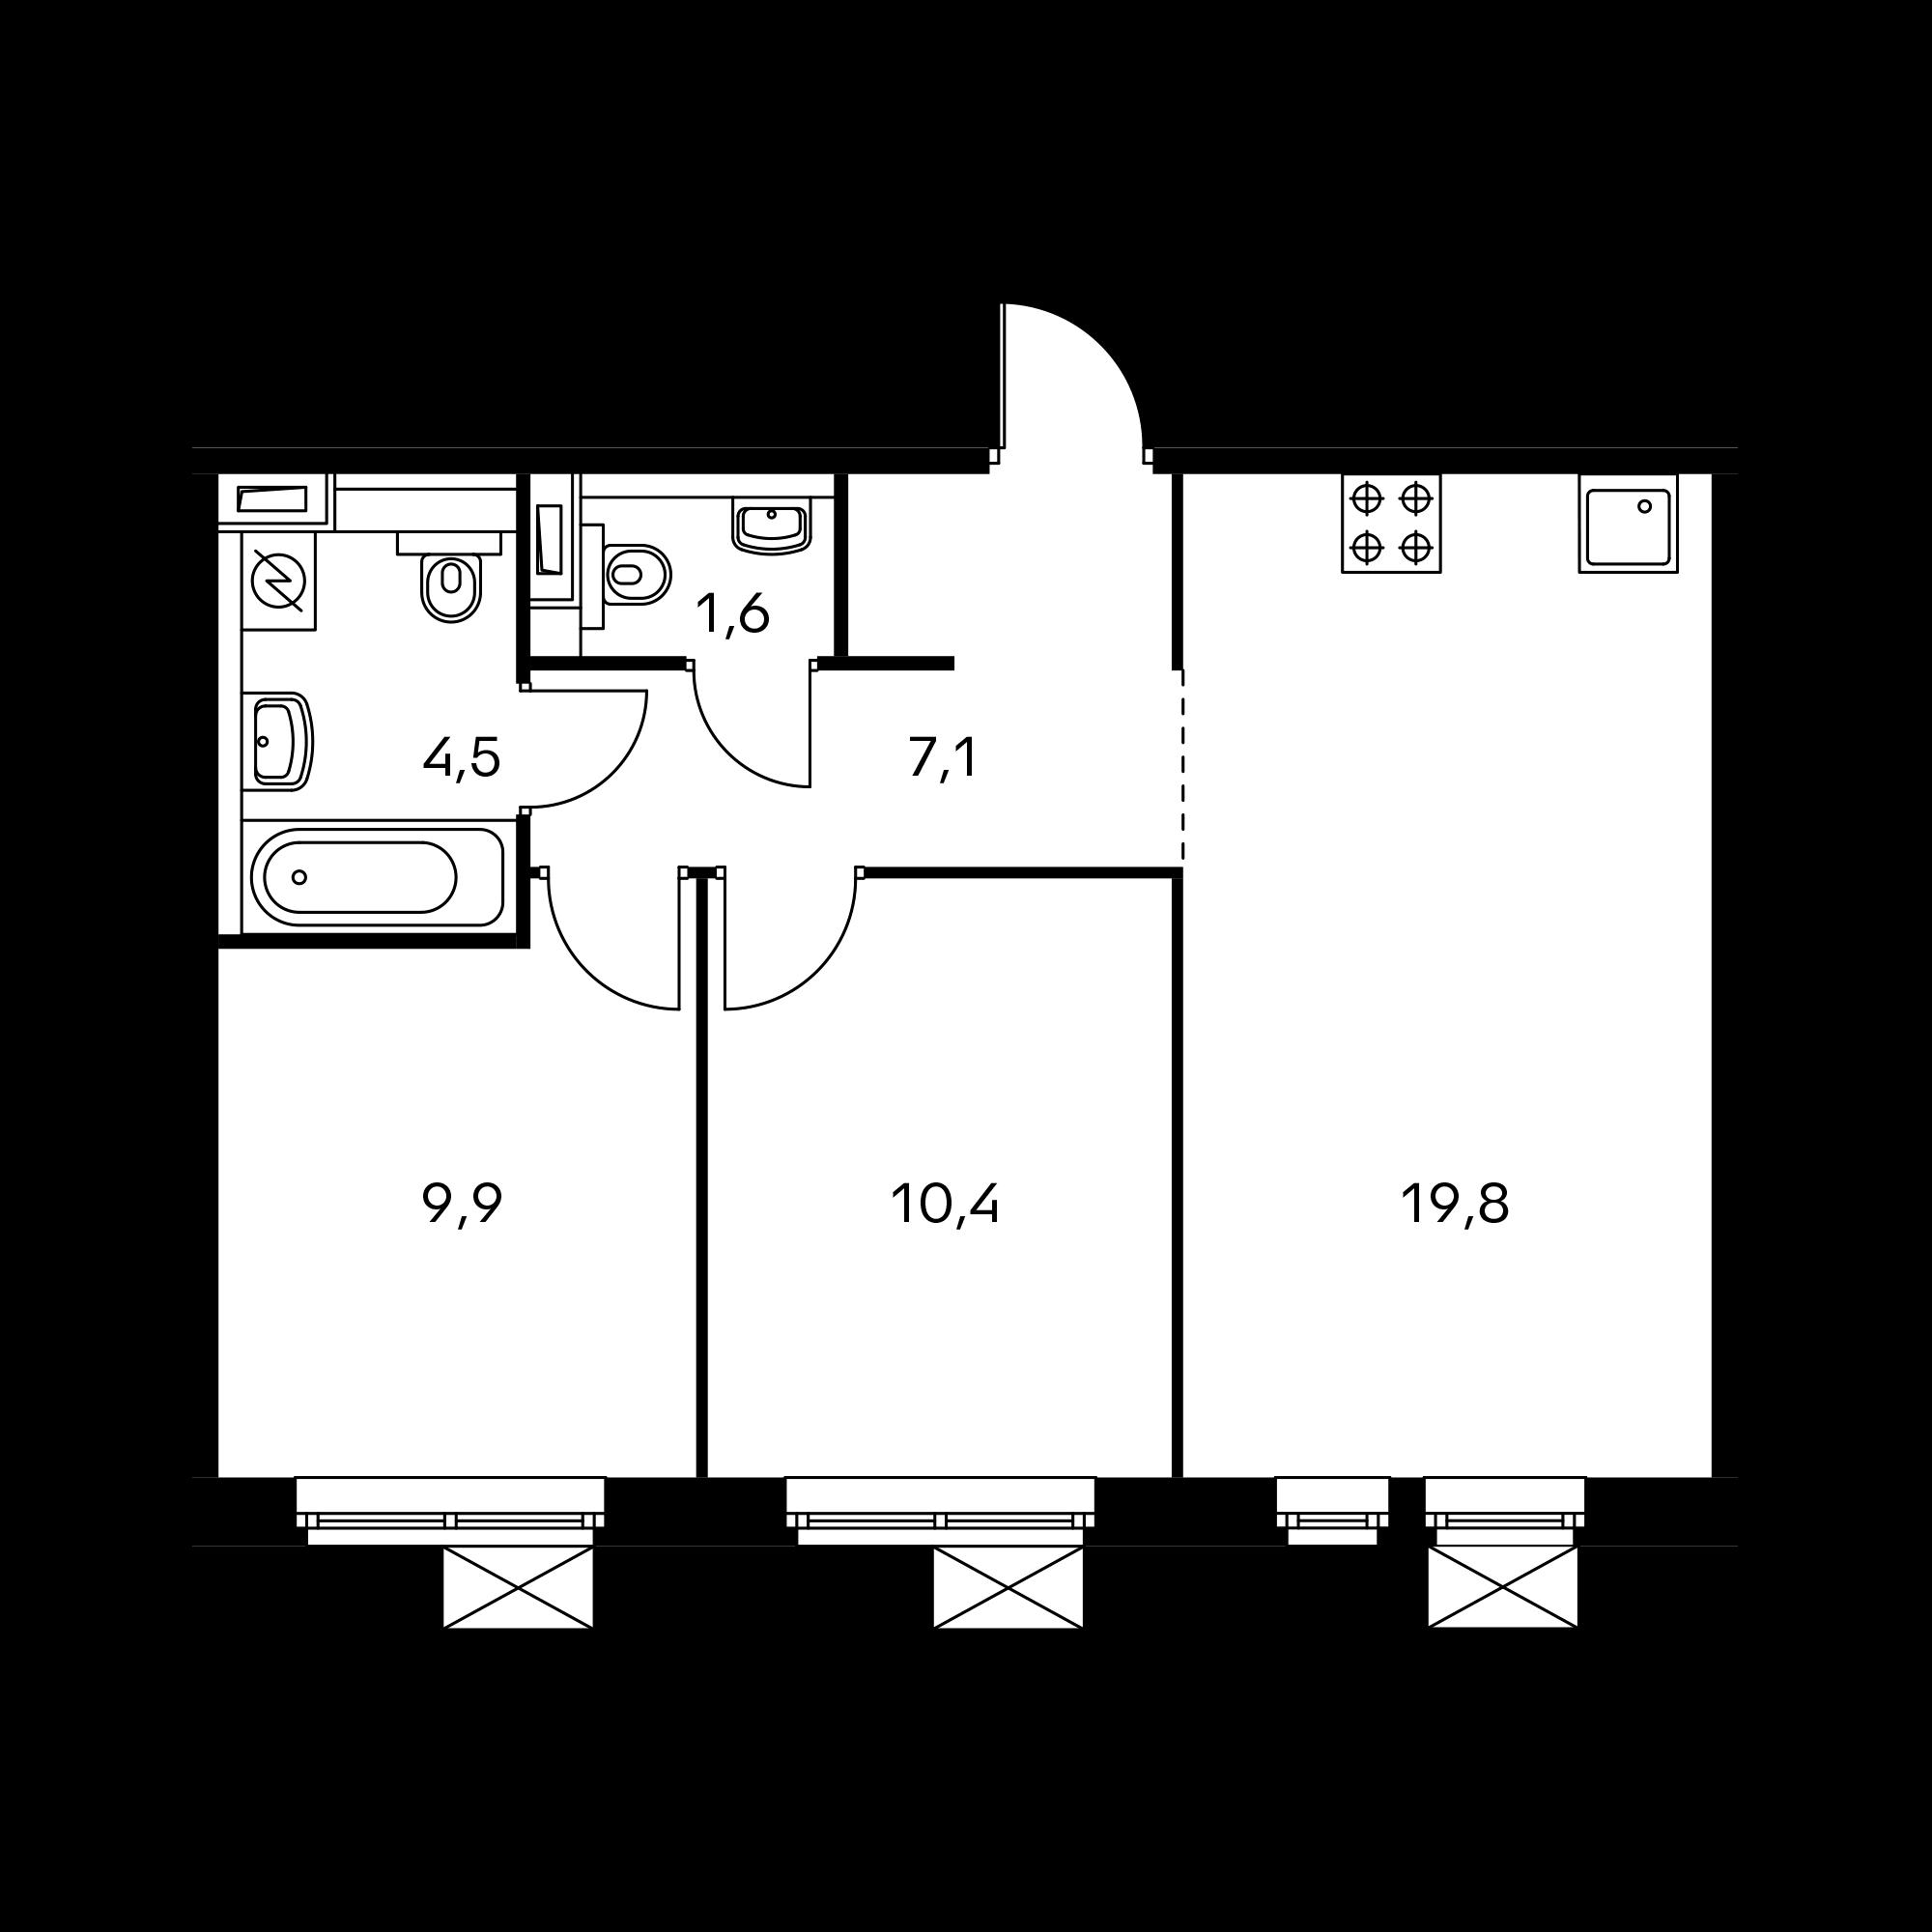 2ES9_9.3-2